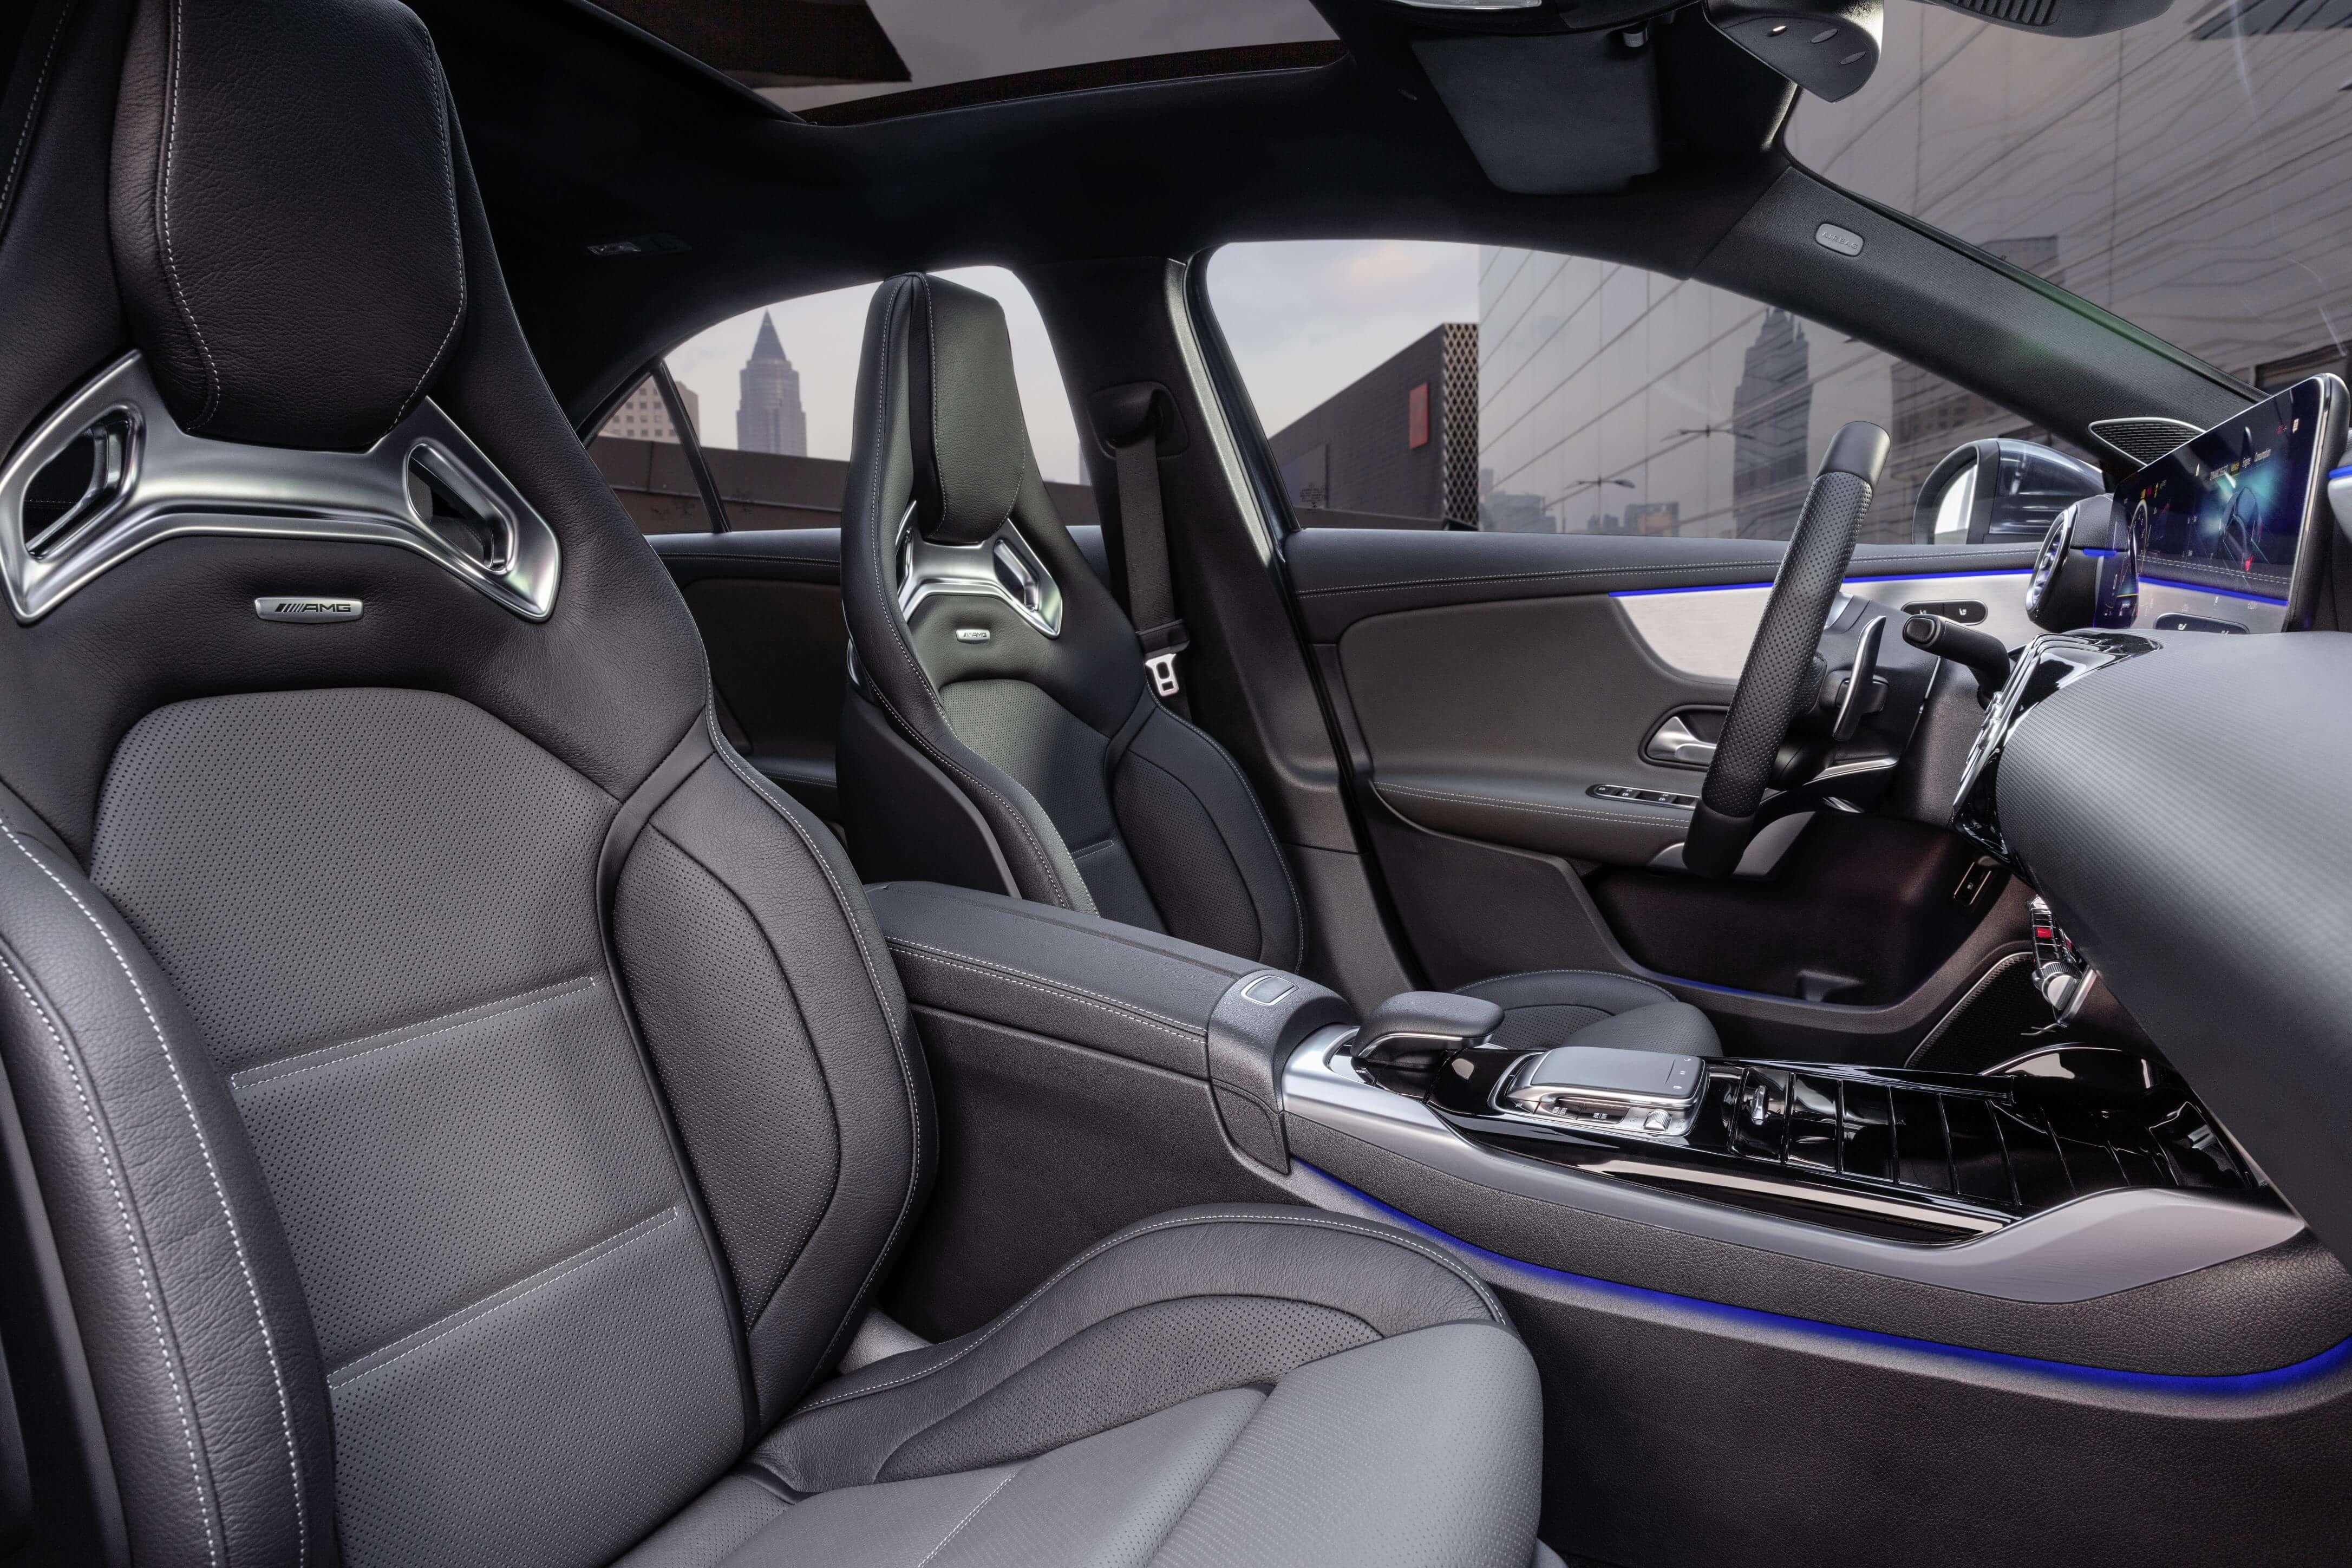 Mercedes-AMG A 35 4MATIC Sedán: asientos